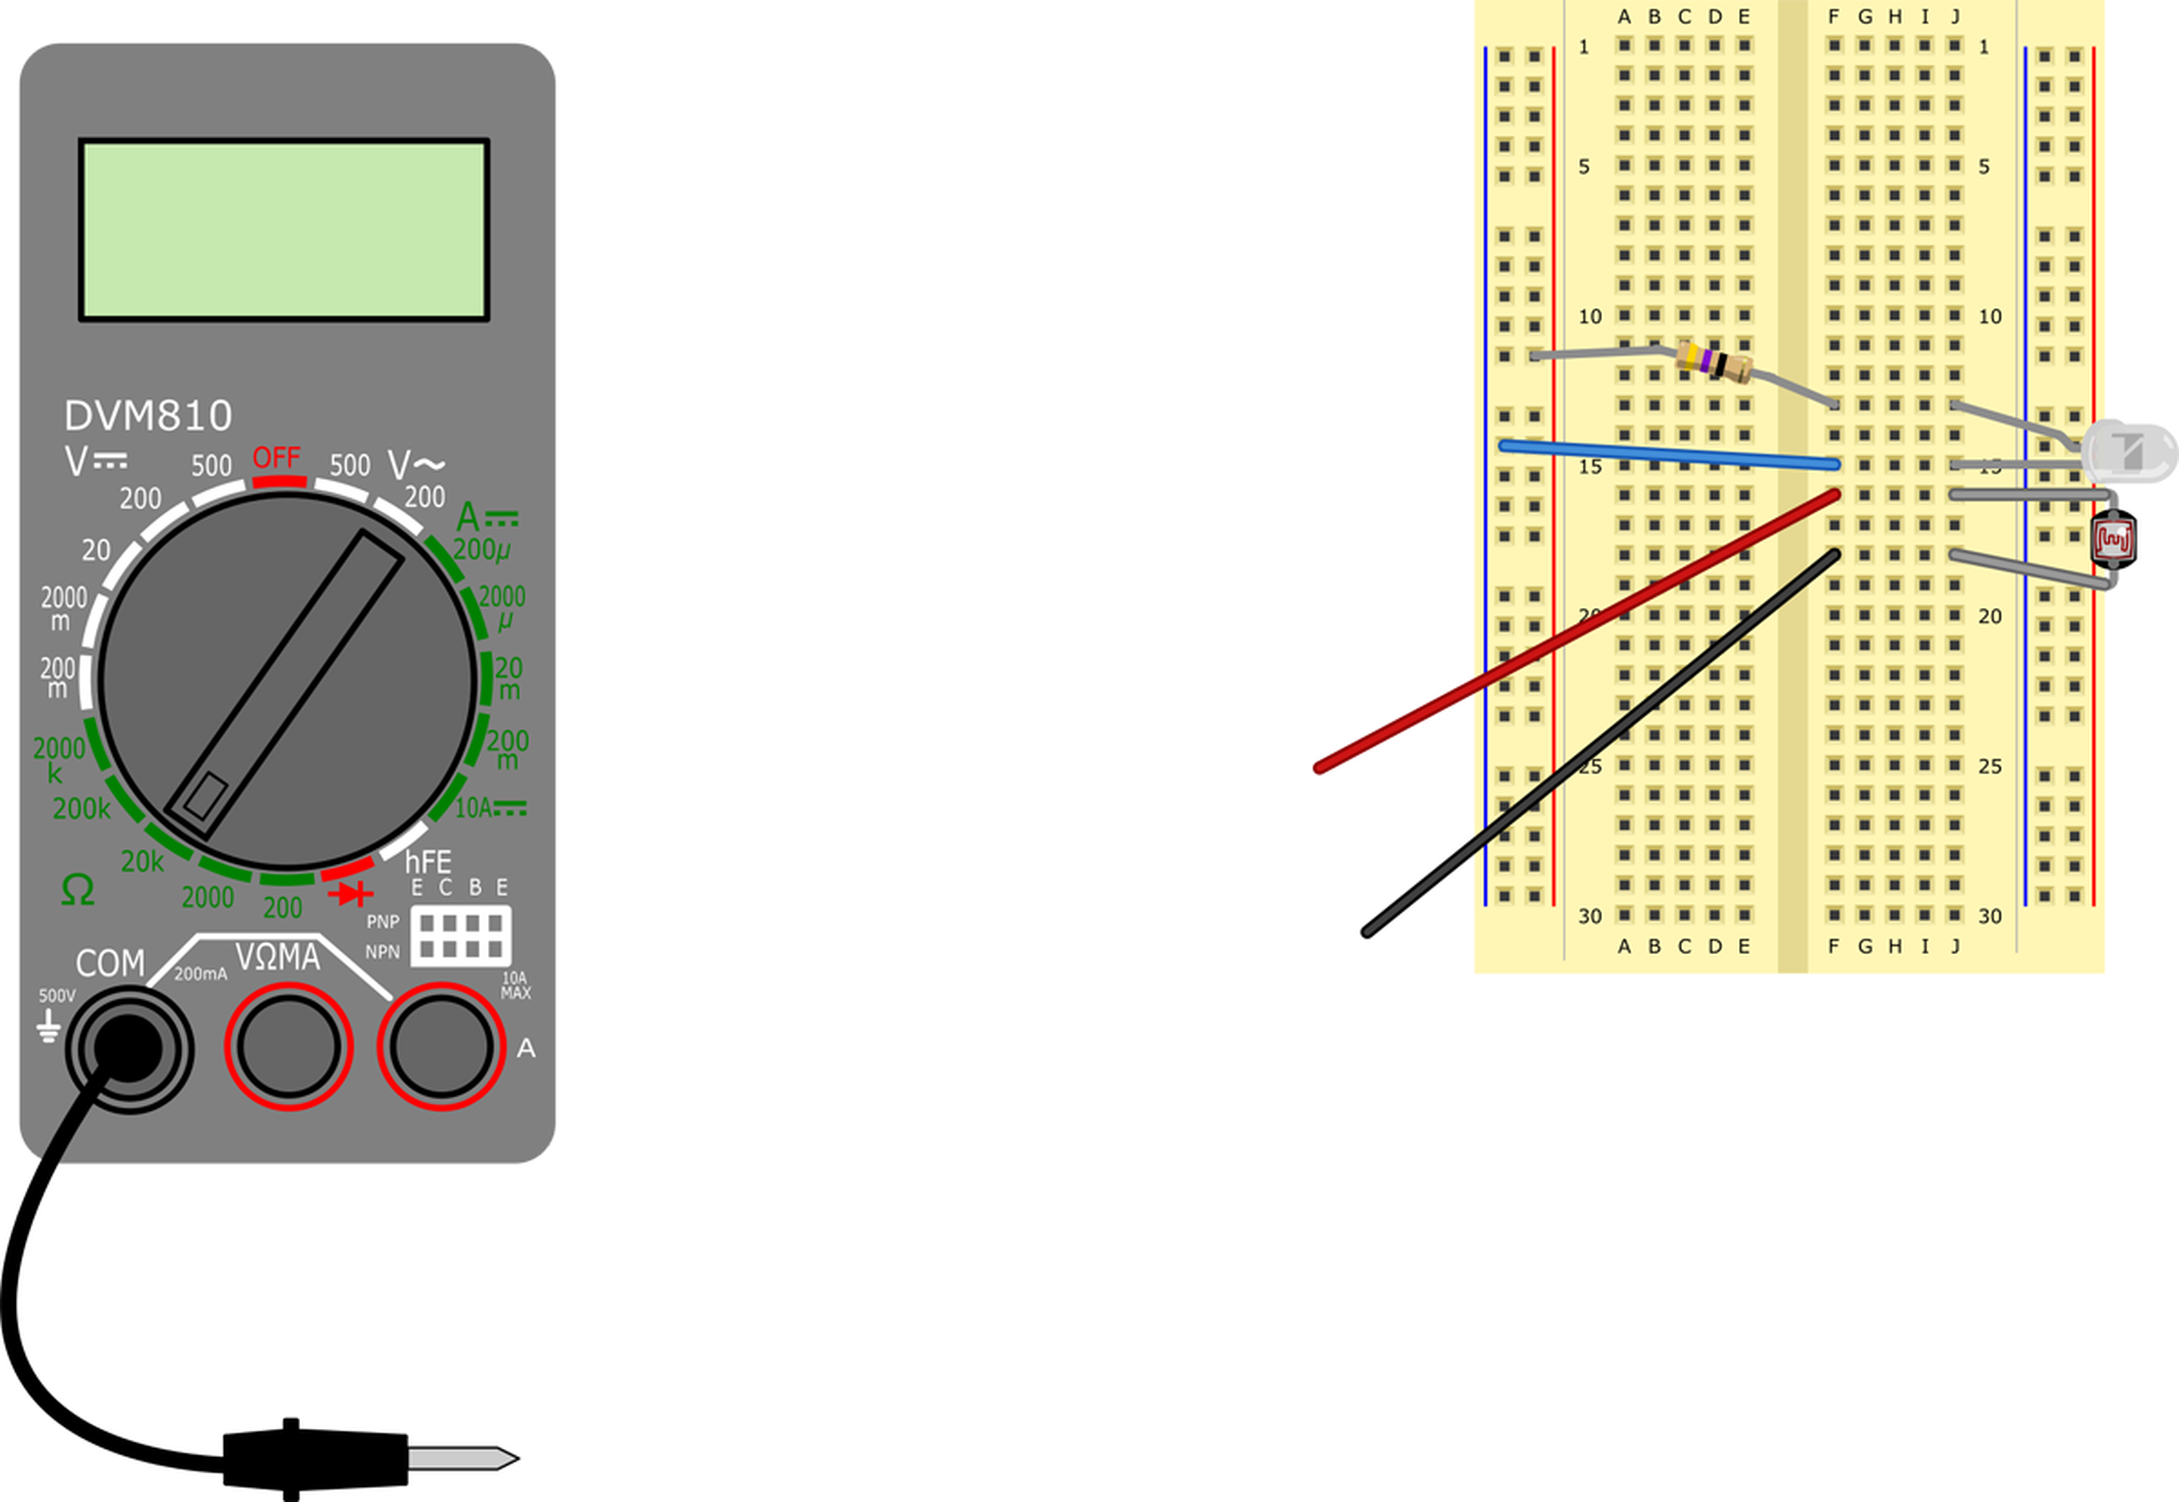 Multimeter probe